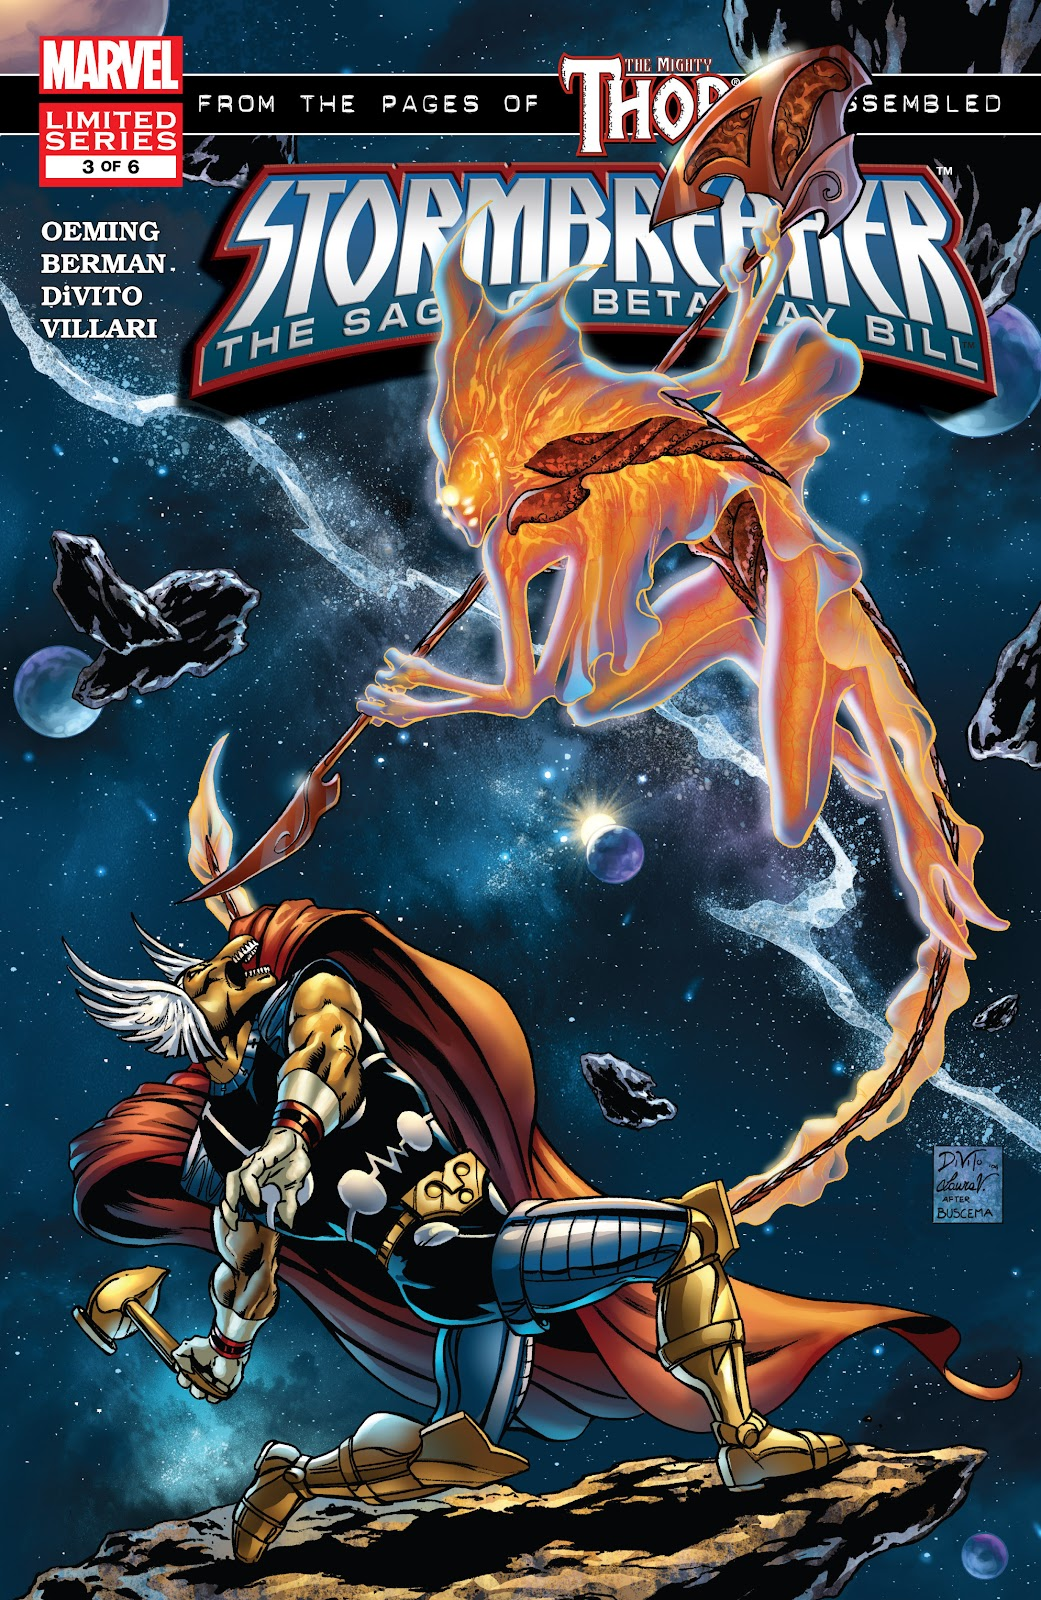 Read online Thor: Ragnaroks comic -  Issue # TPB (Part 4) - 6